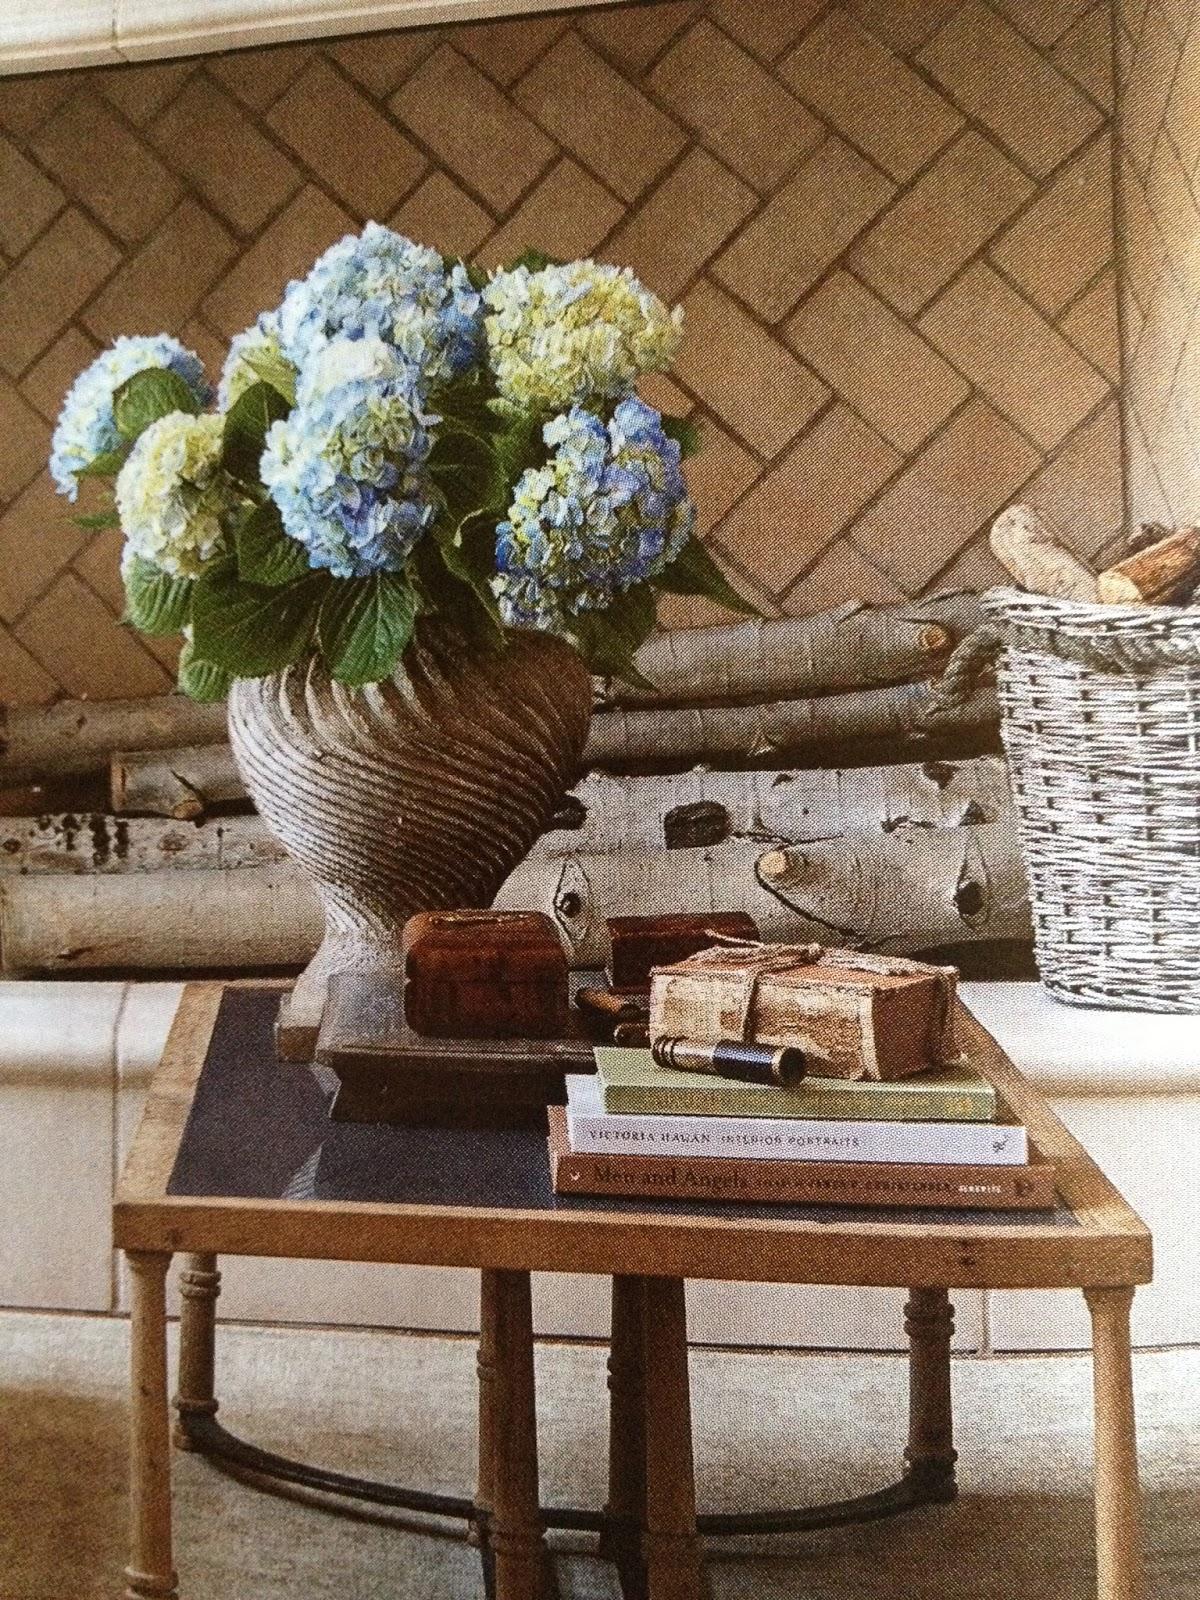 French Country Kitchen Chairs Refurbish Cabinets Vignette Design: Magazine